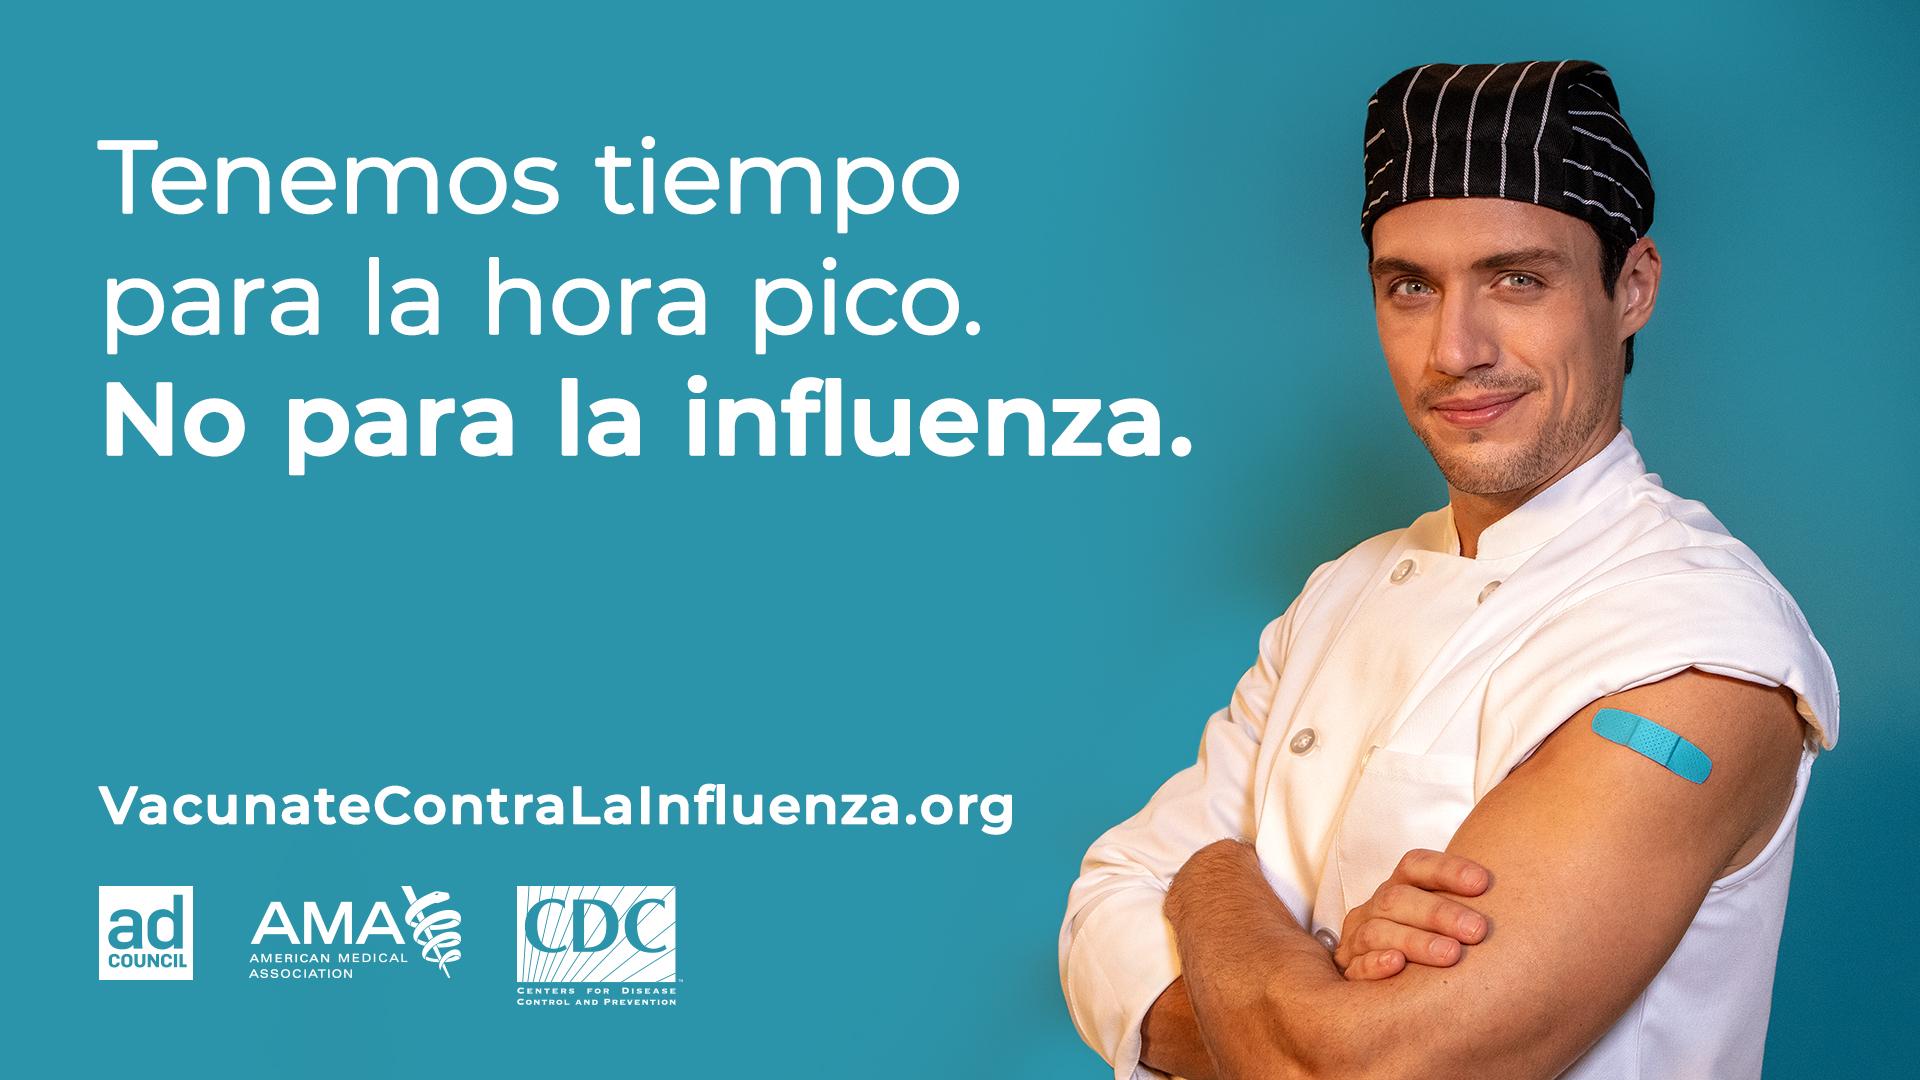 FLU_Chef_Spa_1920x1080